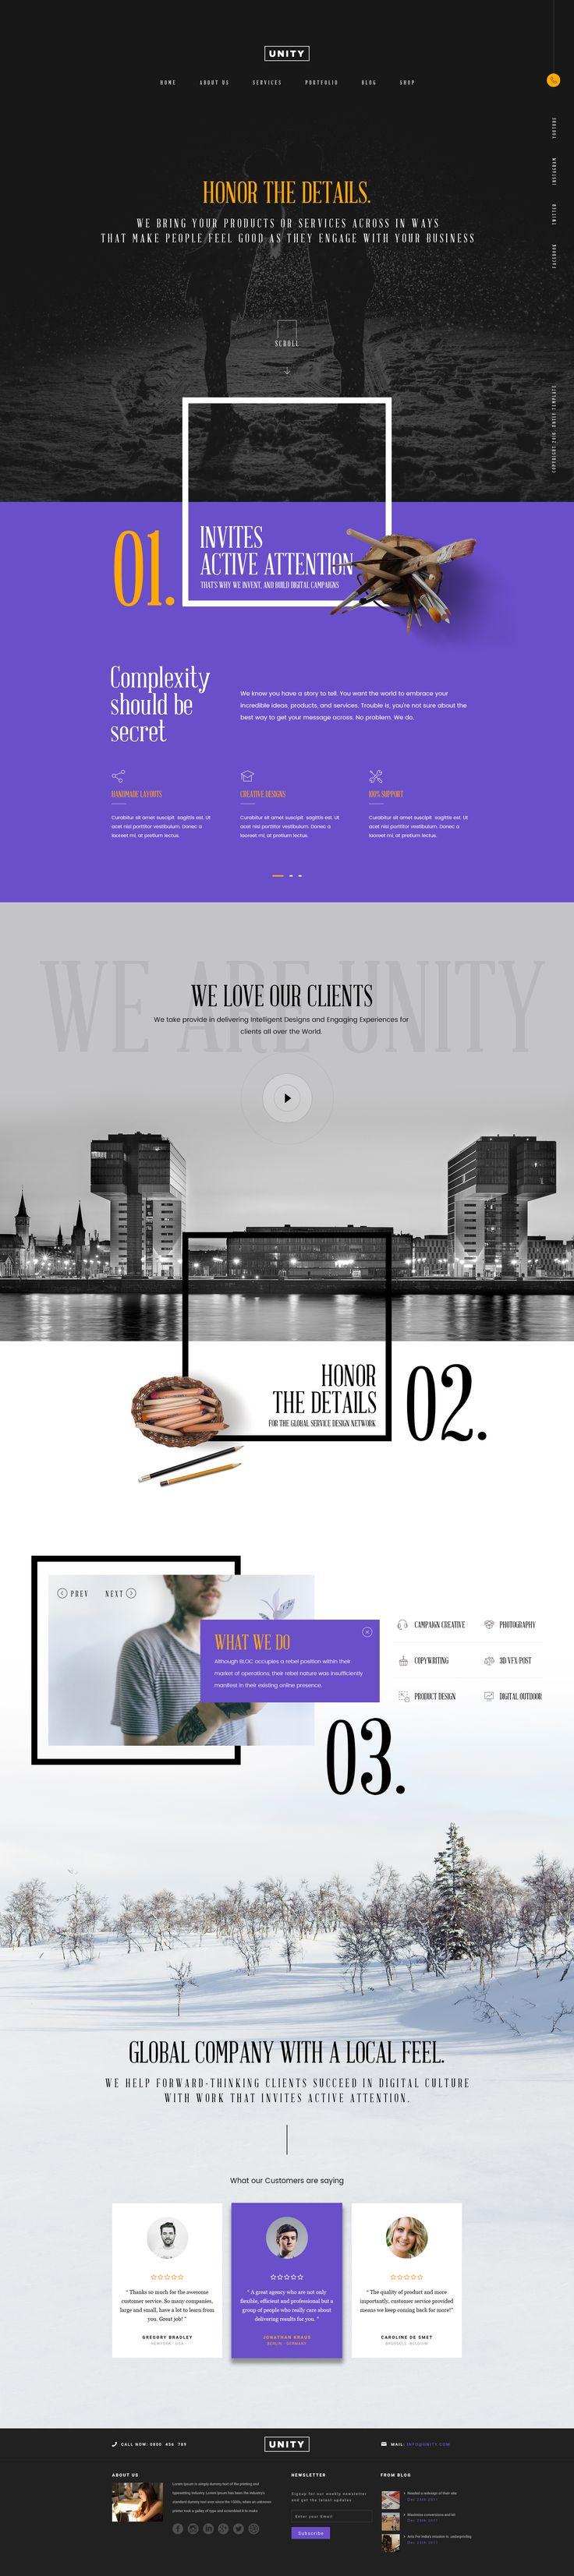 12 best Web Site images on Pinterest   Unity, Website and Design web